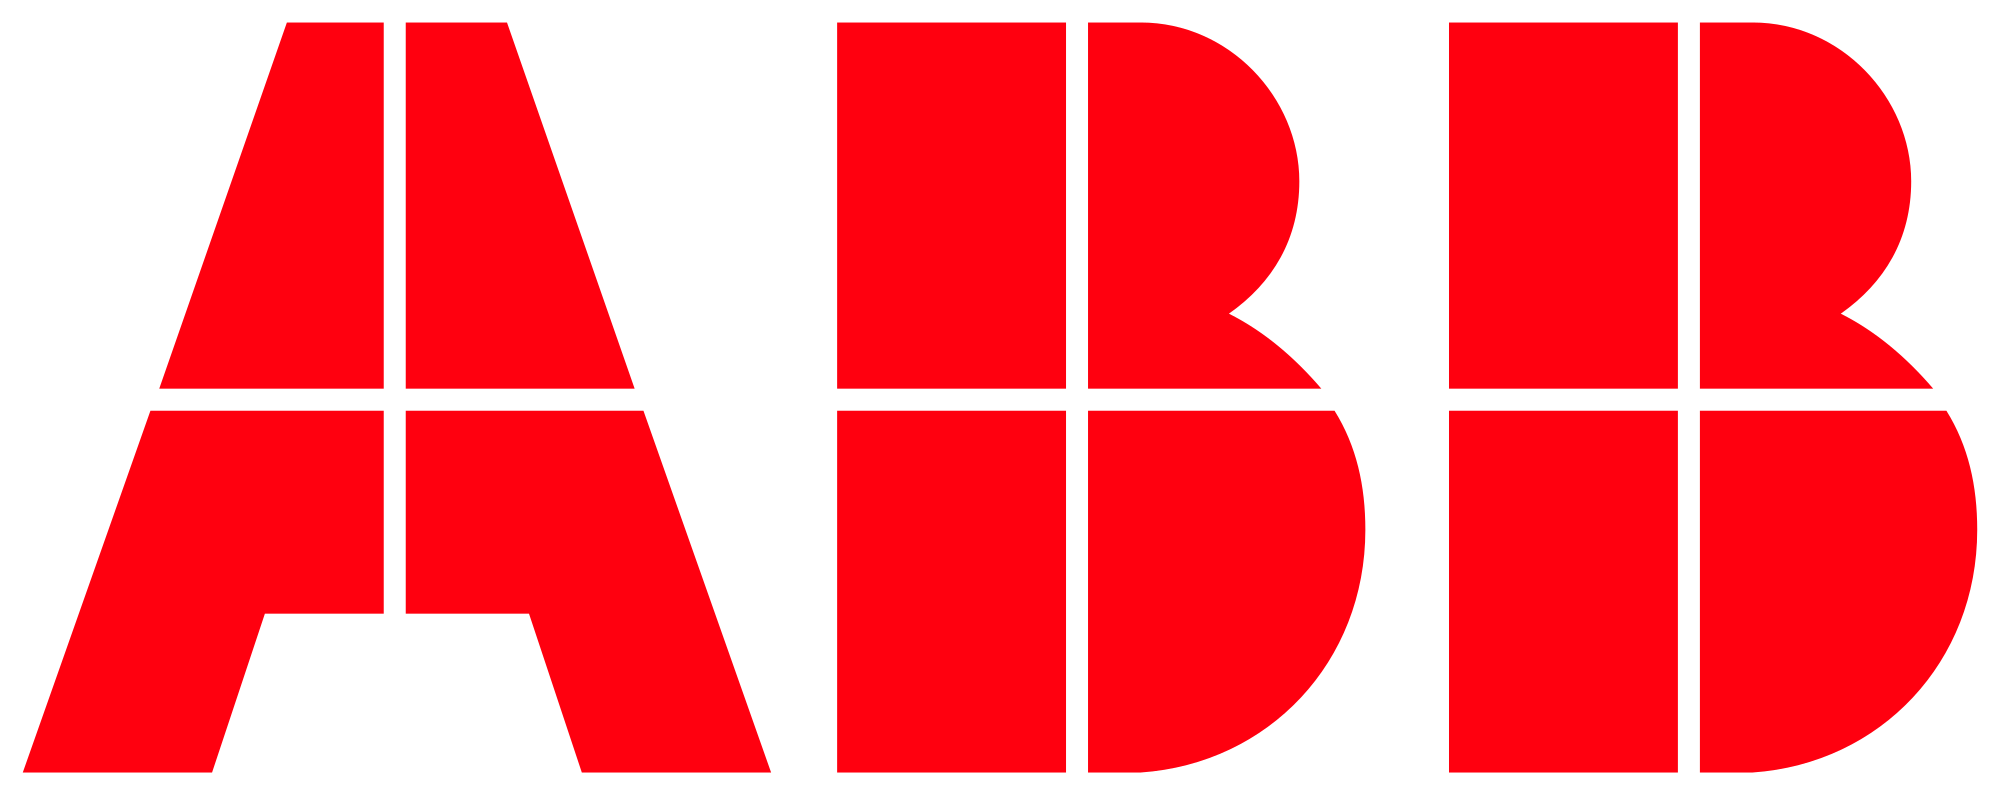 ABB Decathlon logo